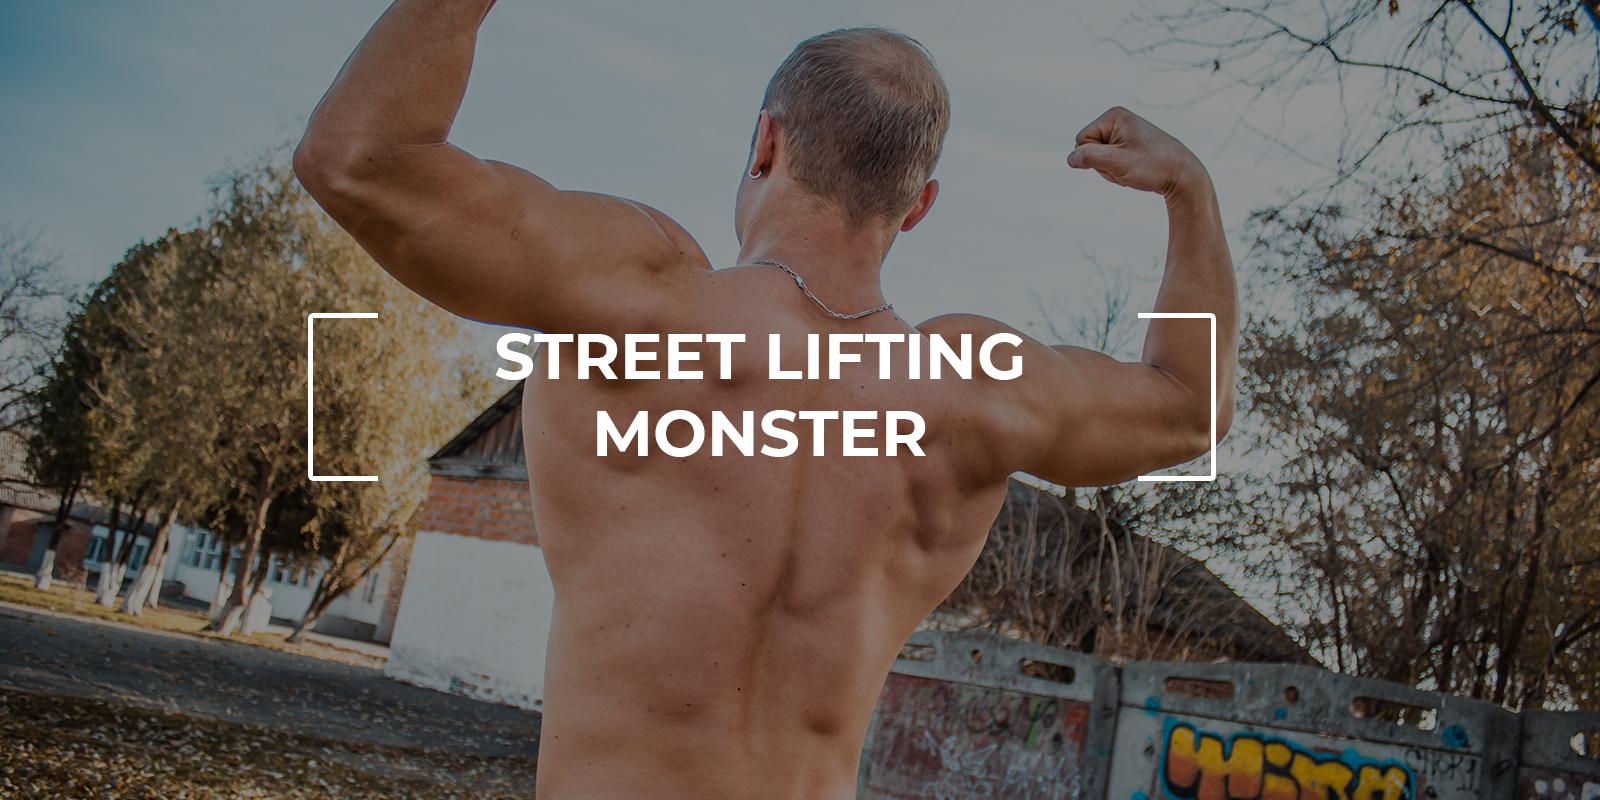 STREET LIFTING MONSTER